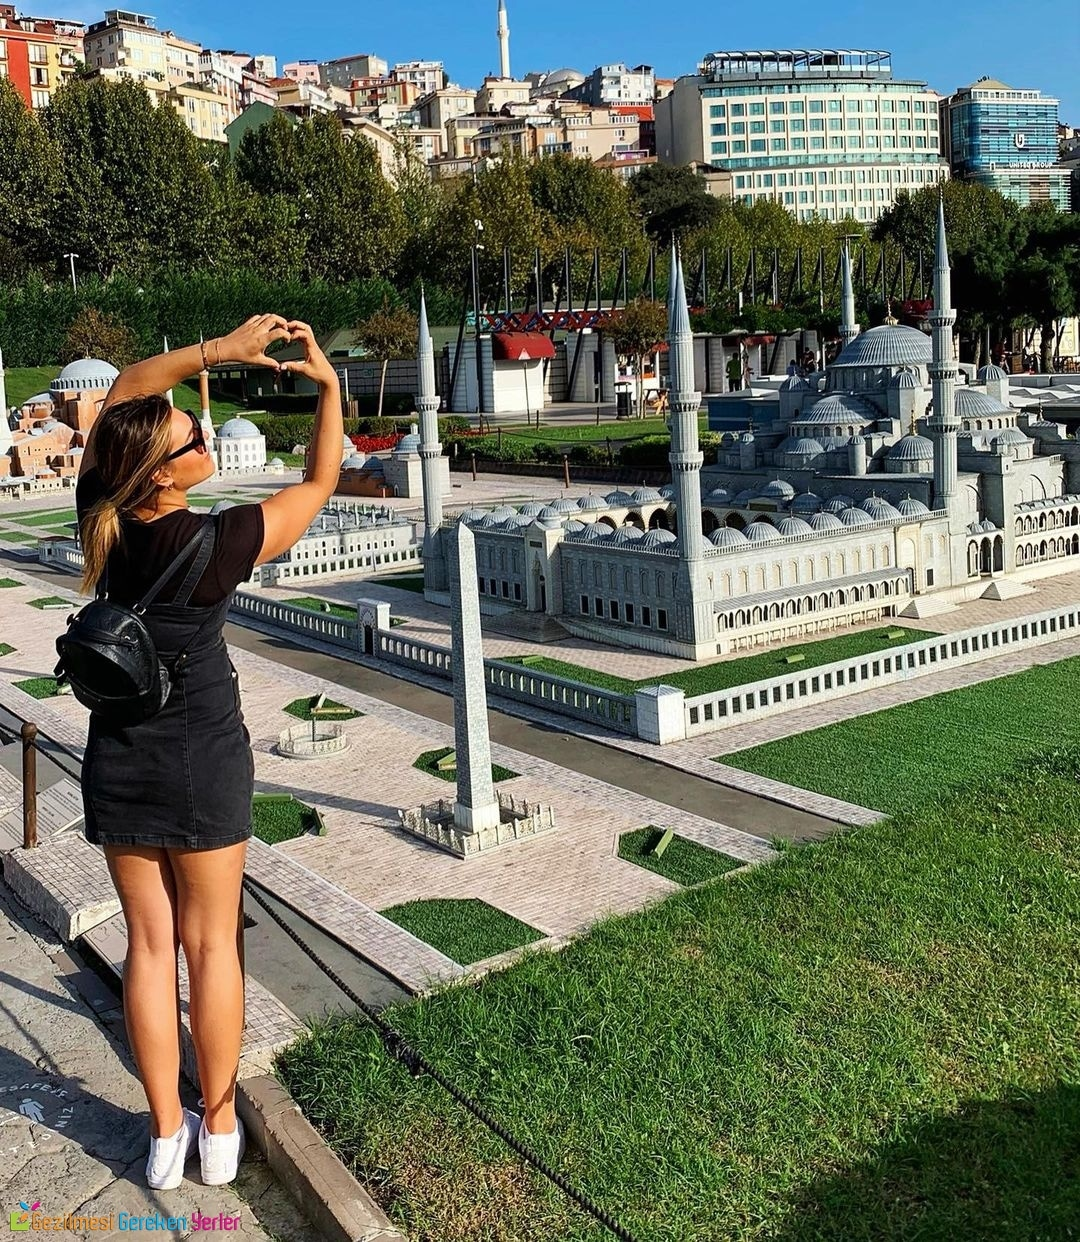 Miniatürk Park